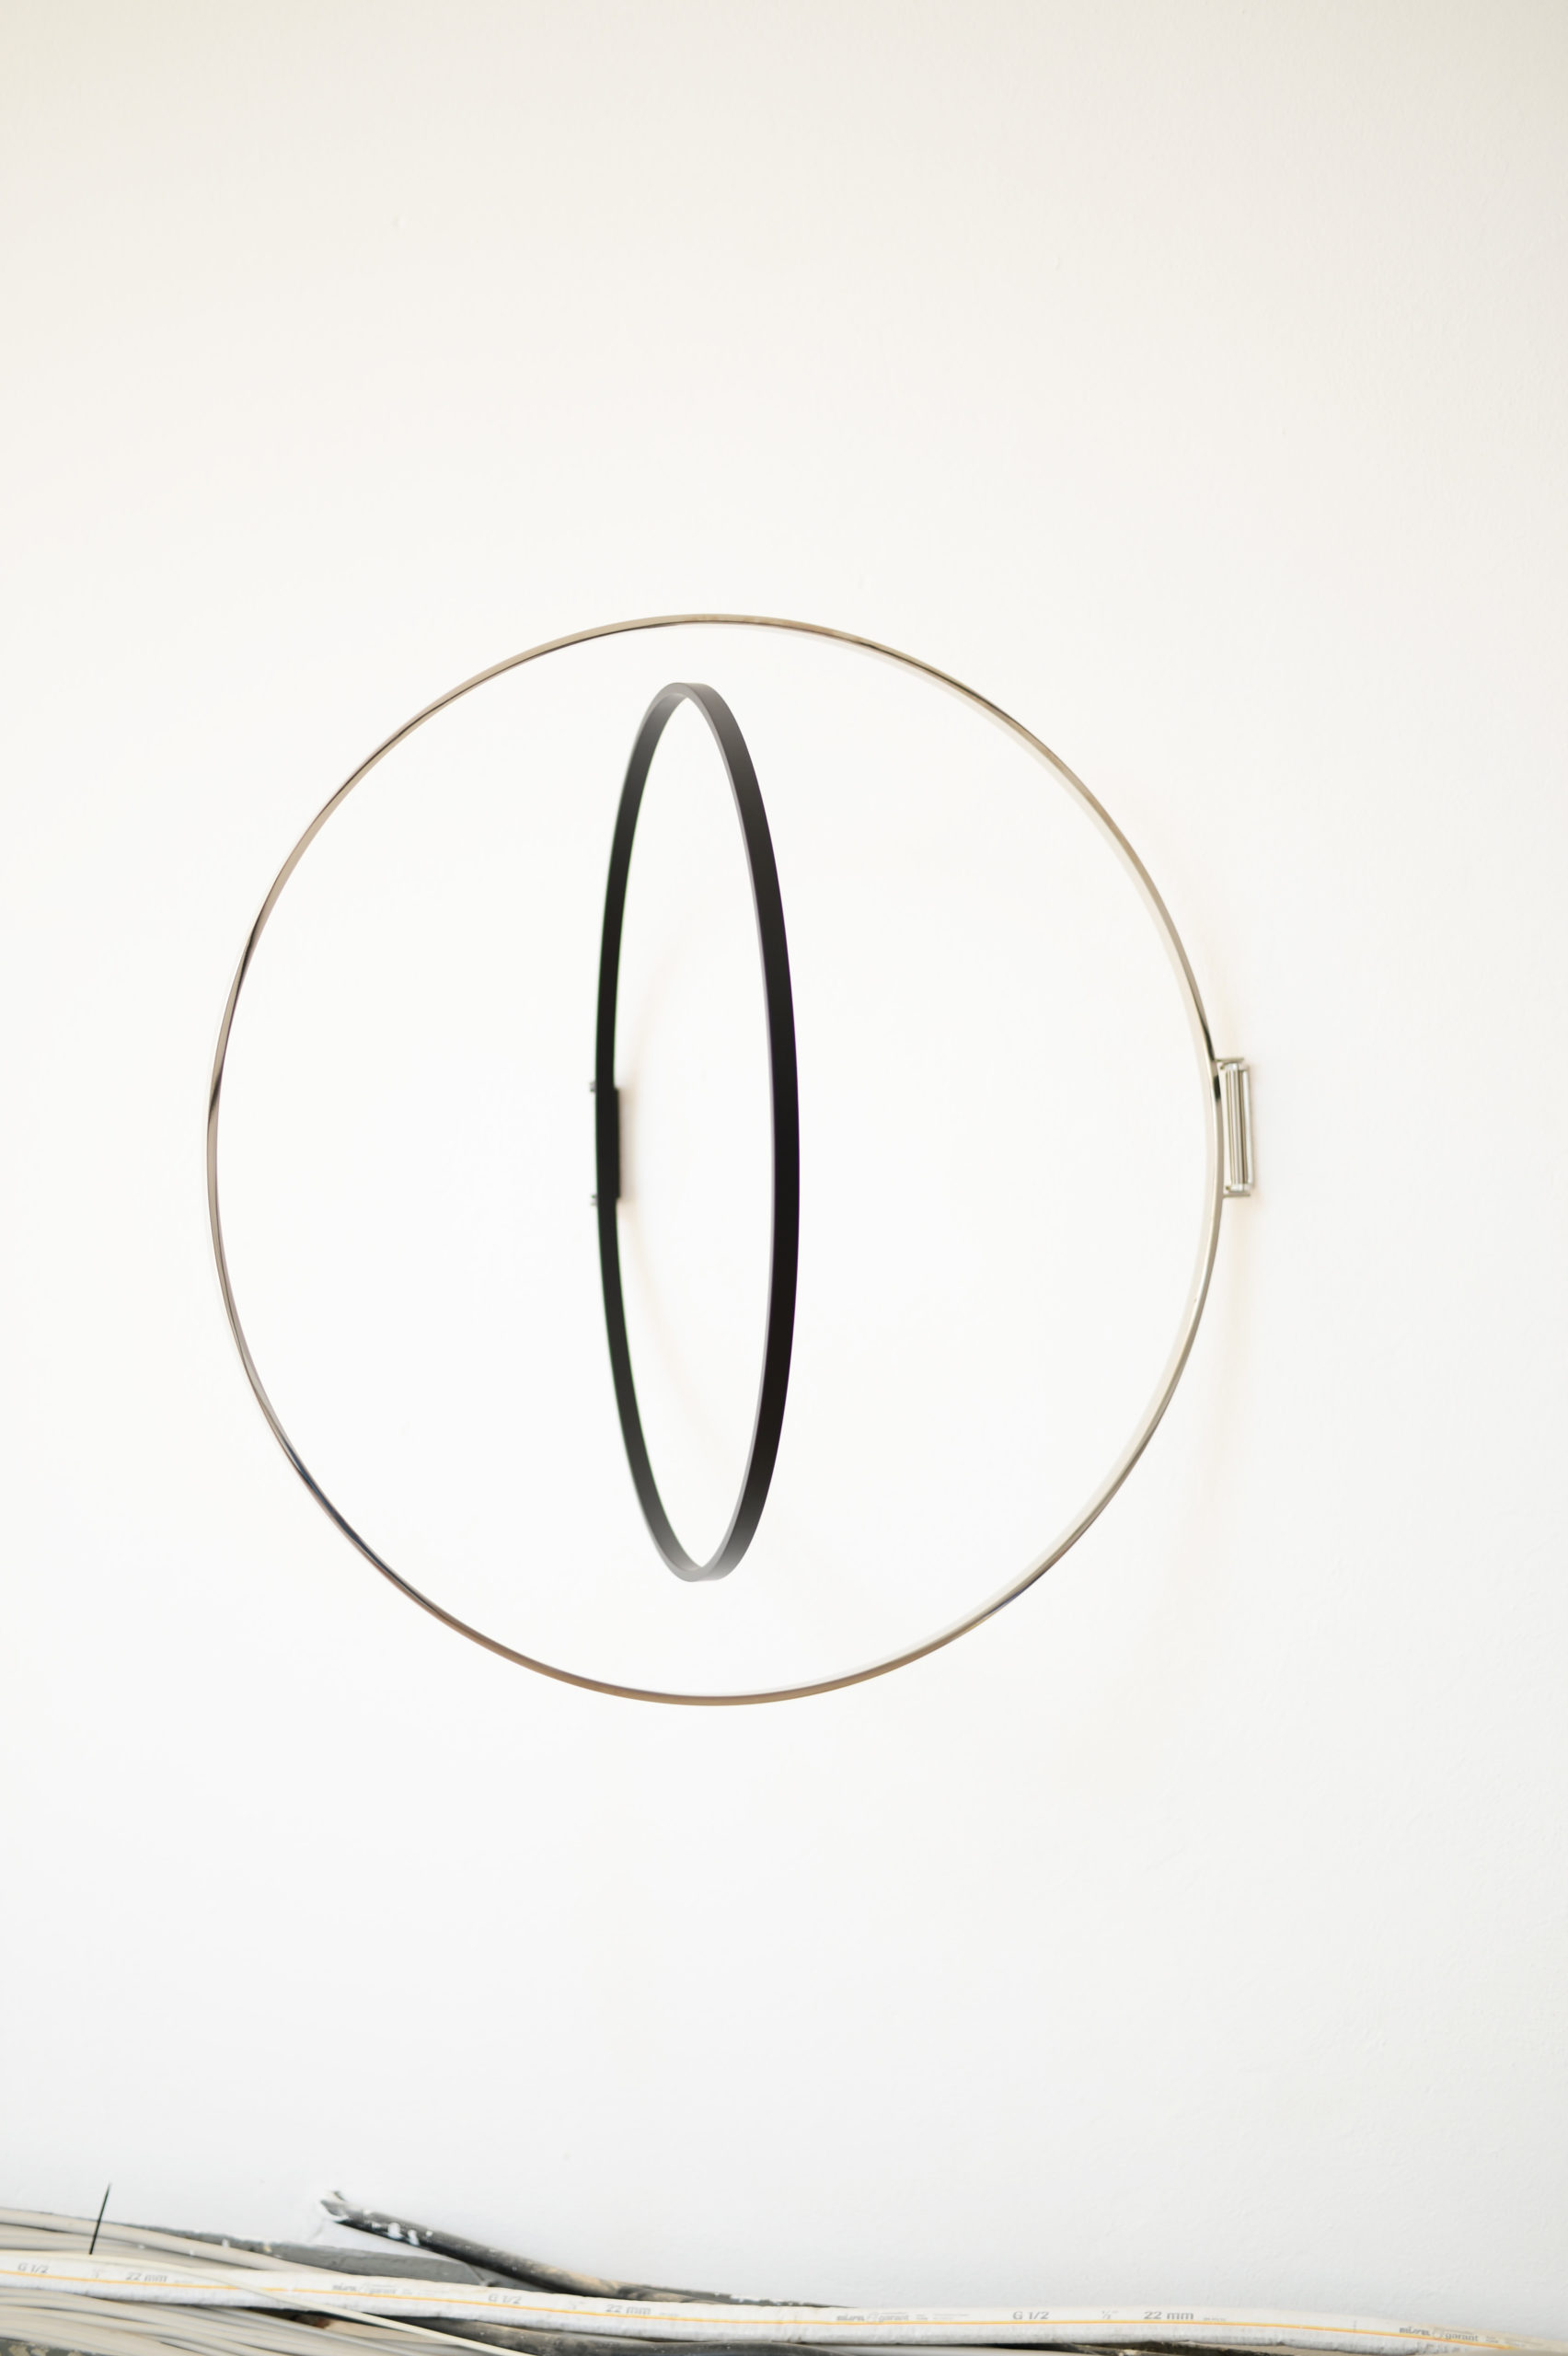 Ringe Stahl Wandmontage Atelier Haußmann